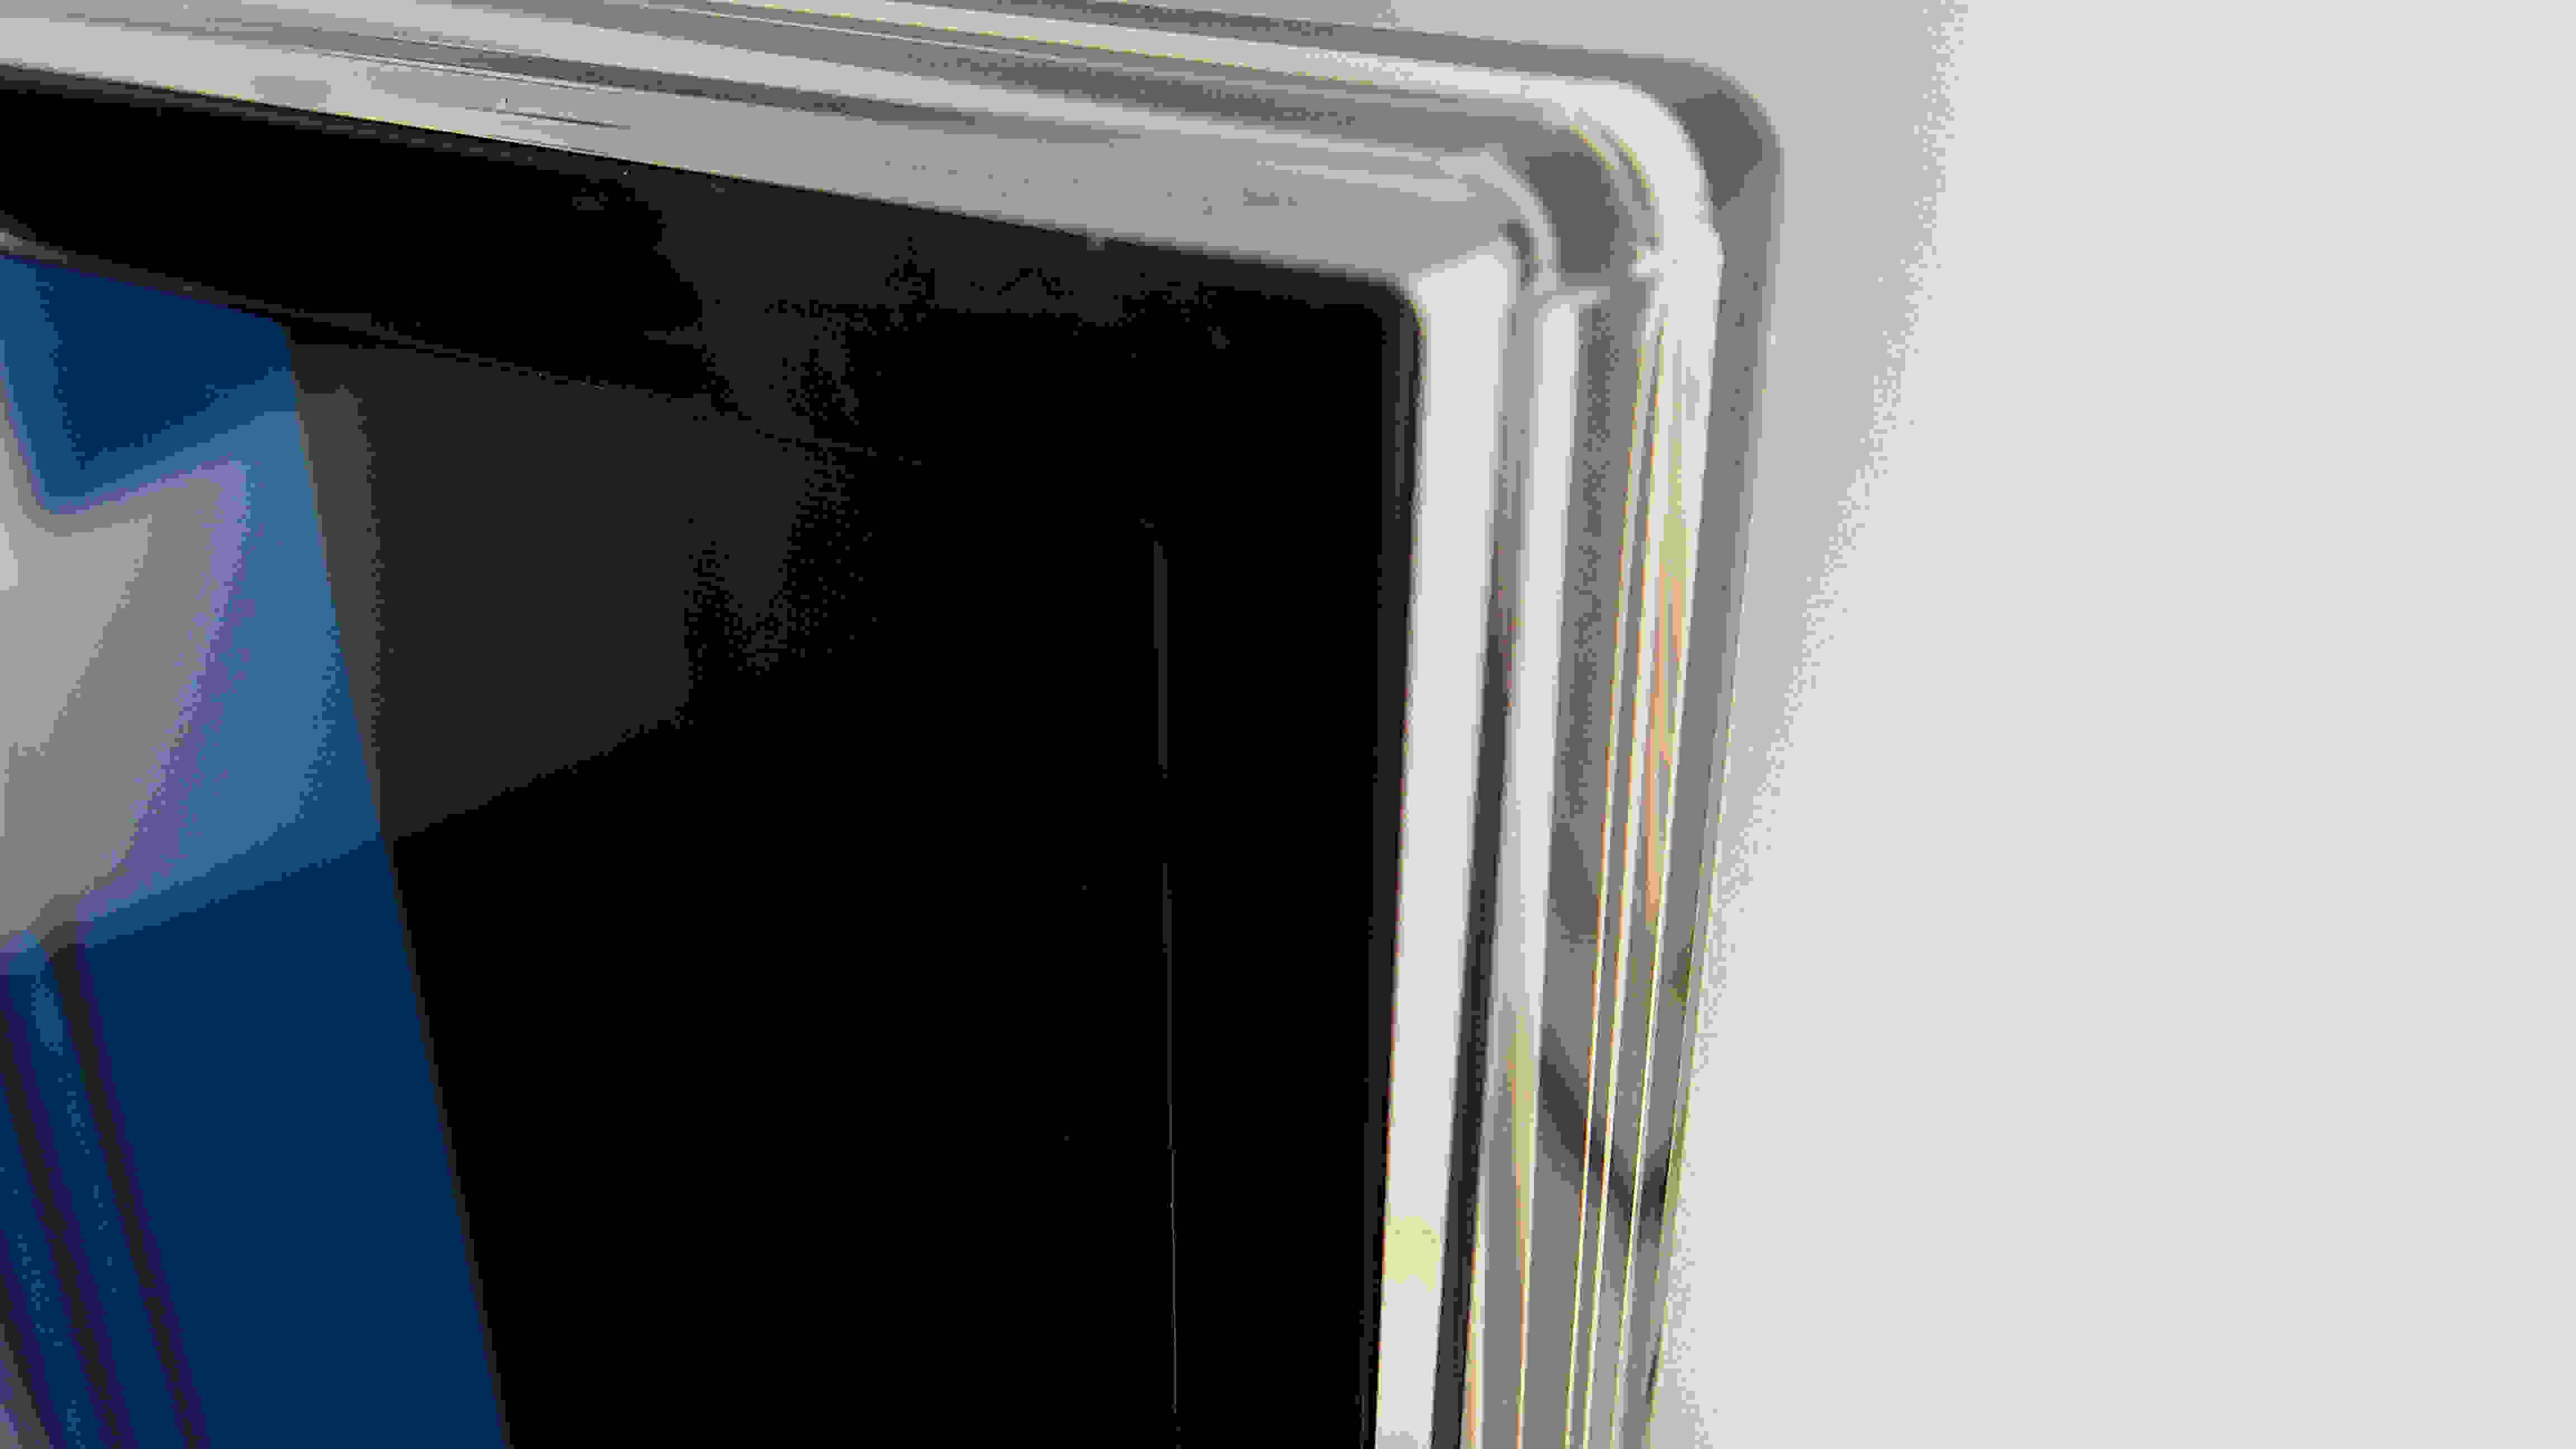 The Samsung UN48H6400 has a thin plastic strip around its perimeter.